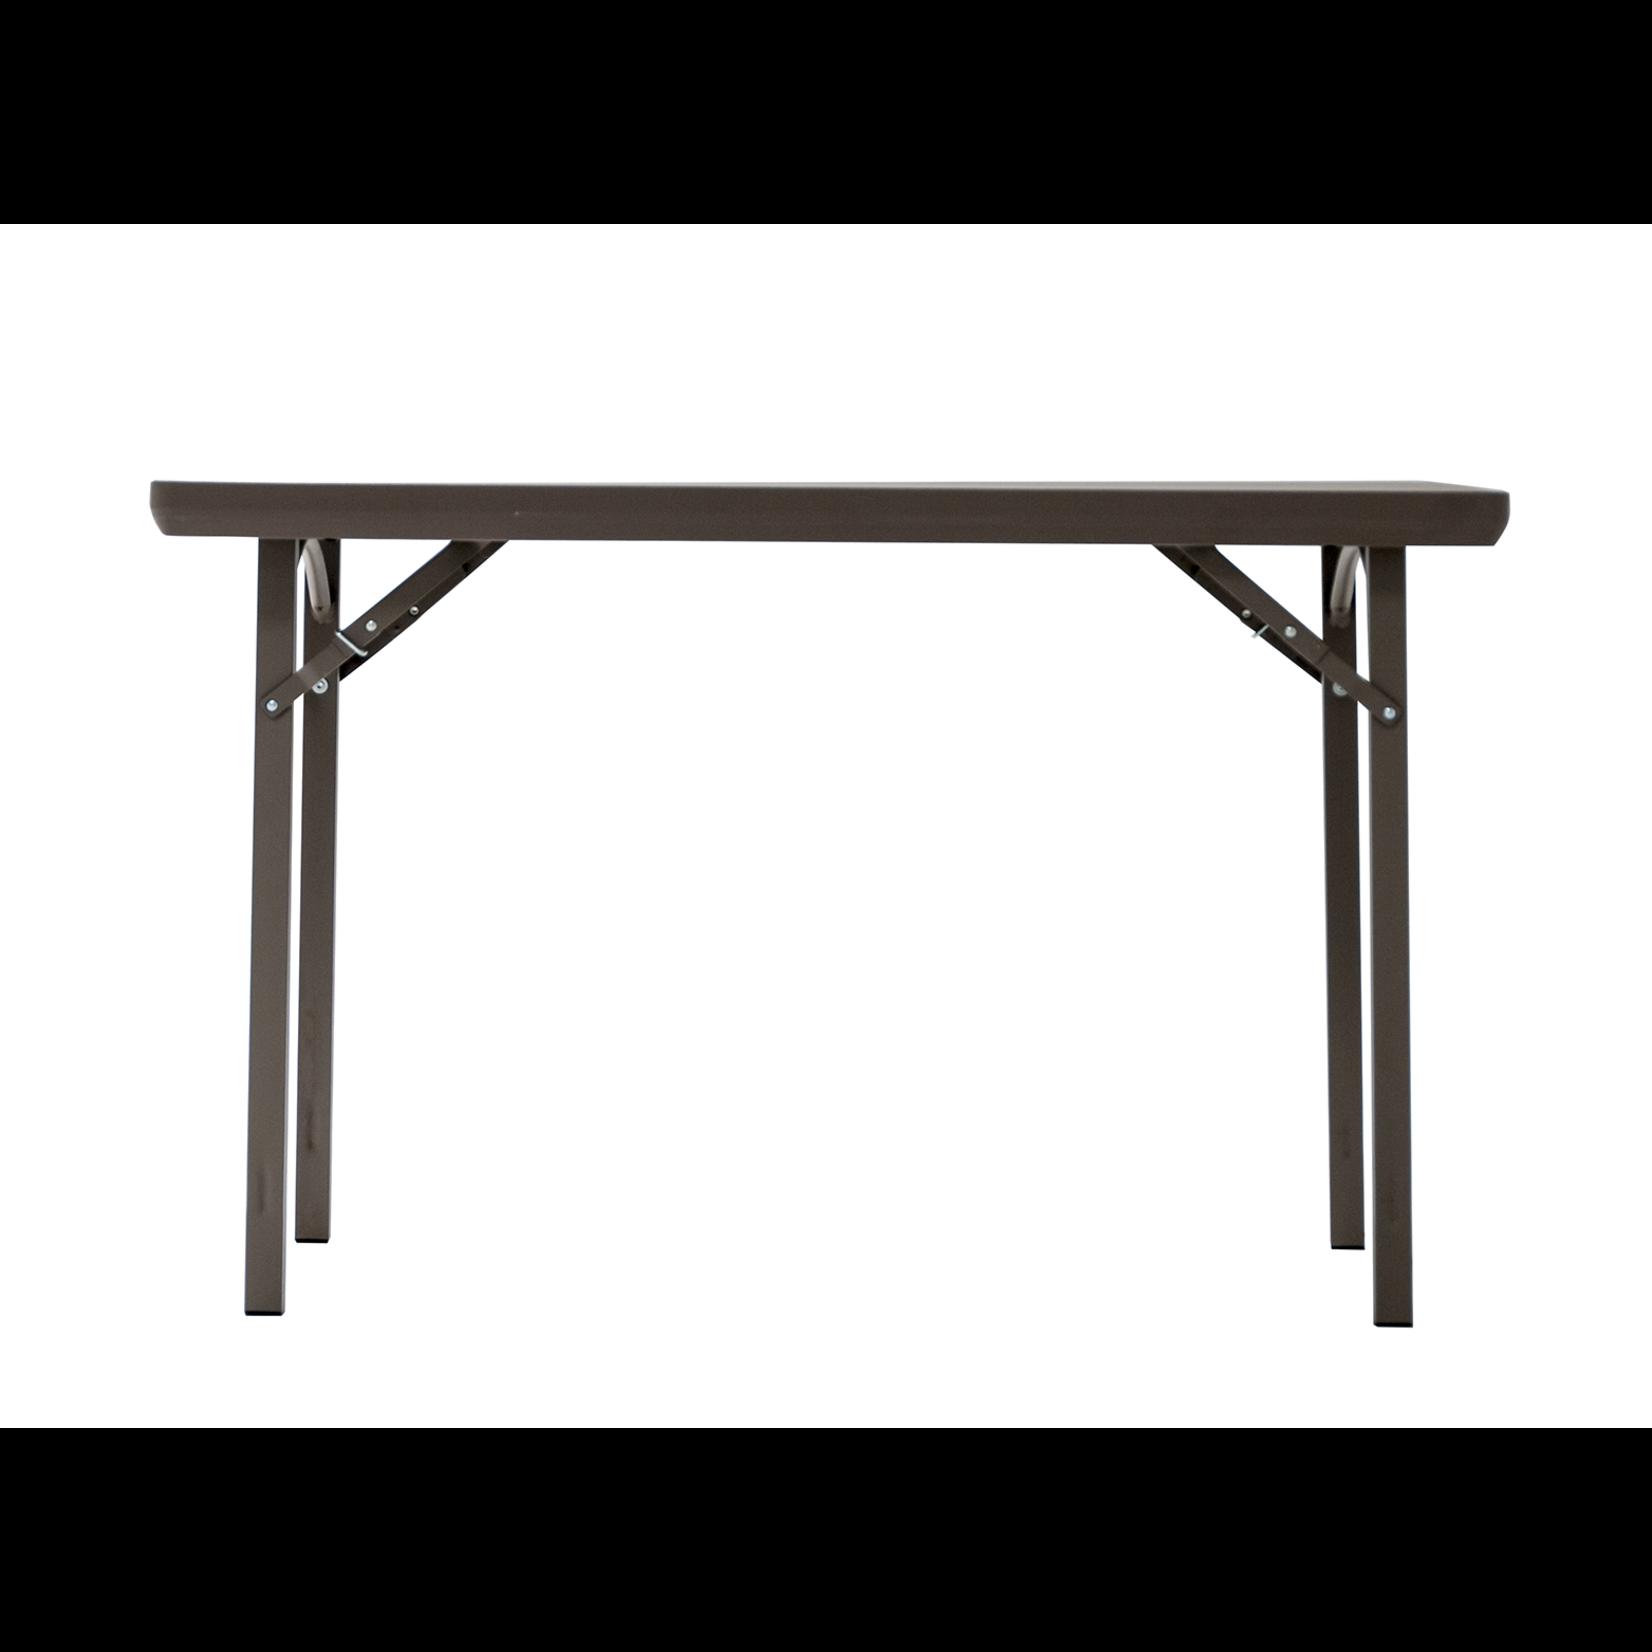 ZOWN XL4 TABLE